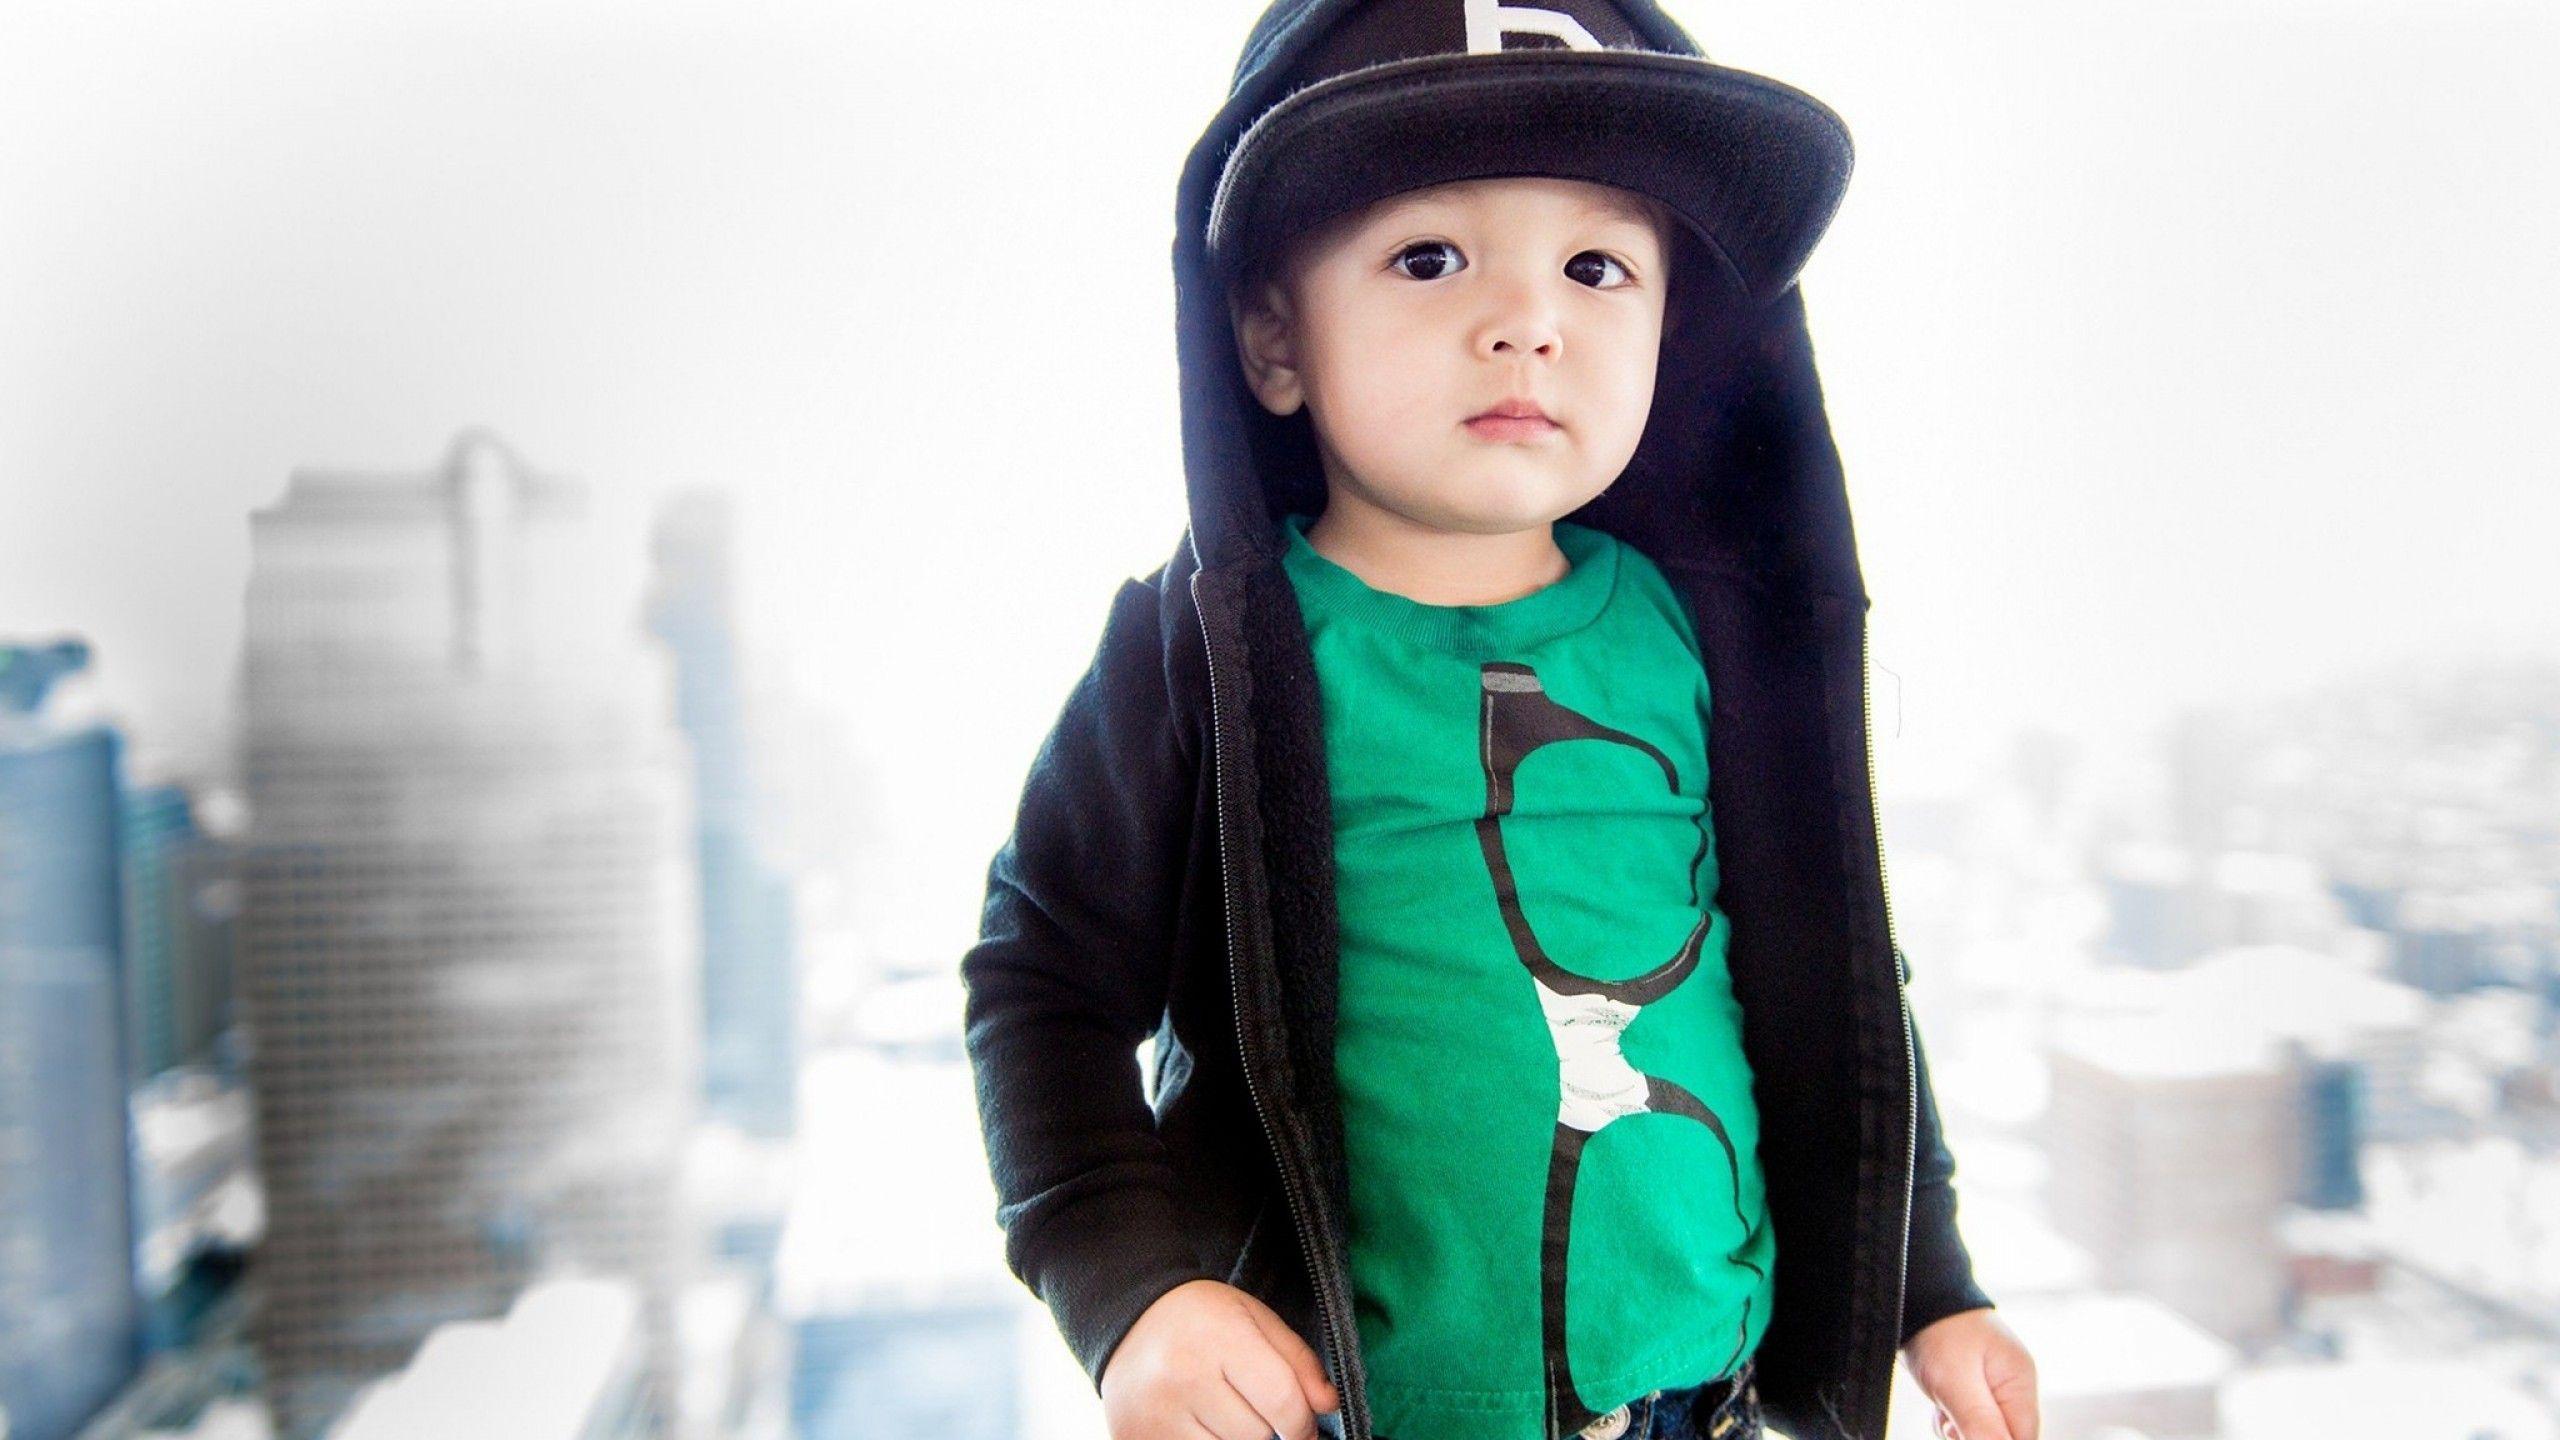 Baby fashionable boy photo new photo